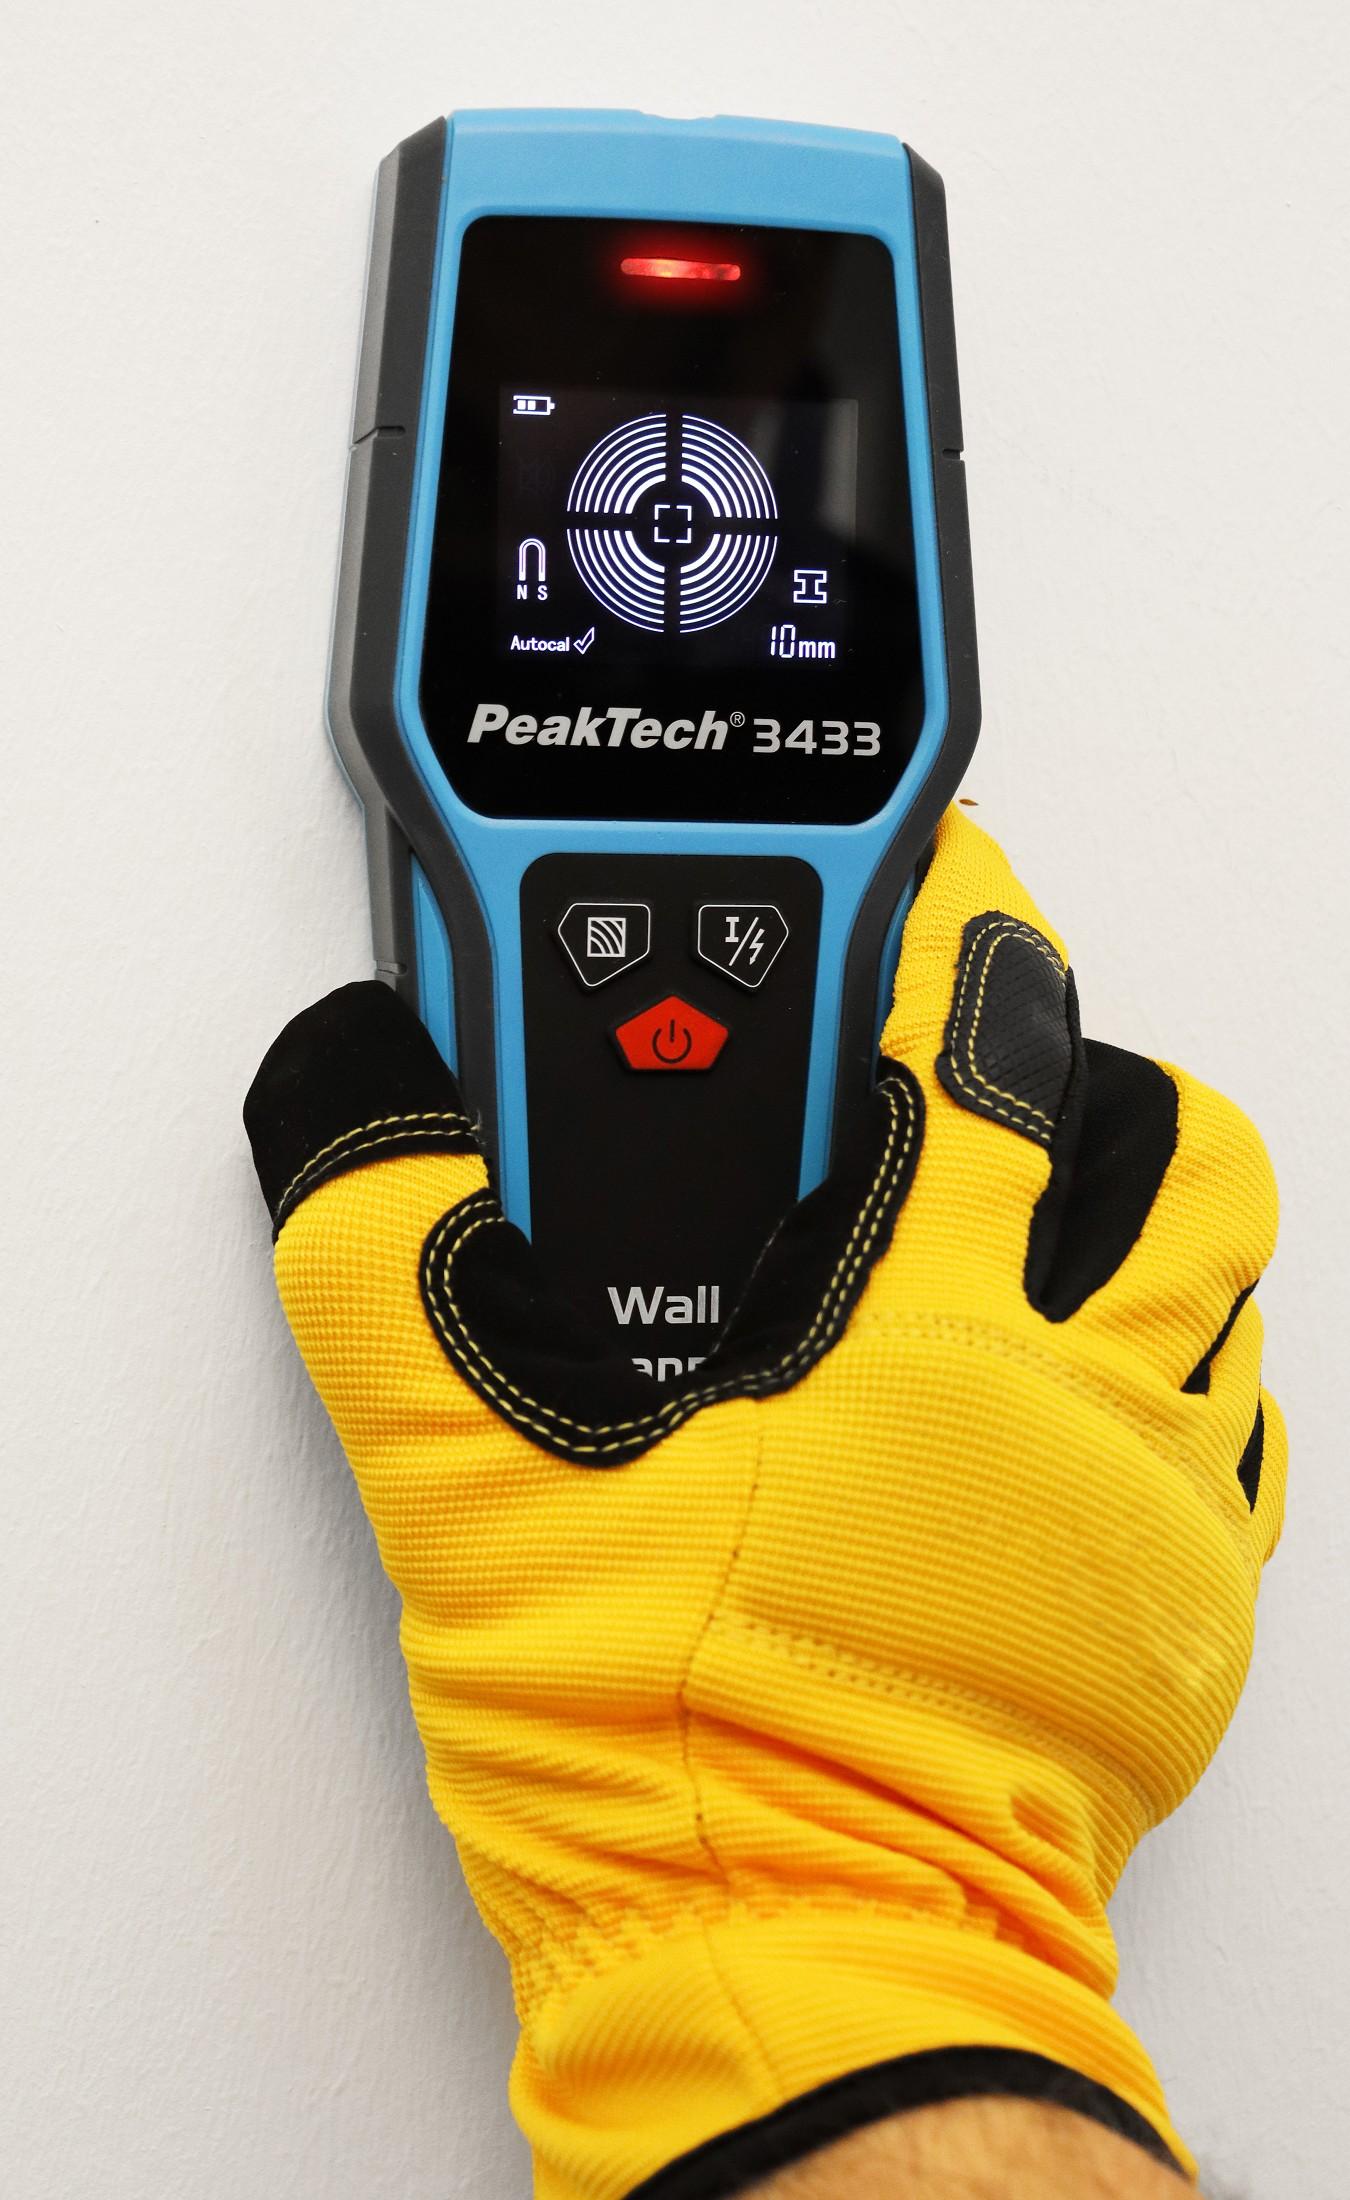 «PeakTech® P 3433» Digital Wall Scanner